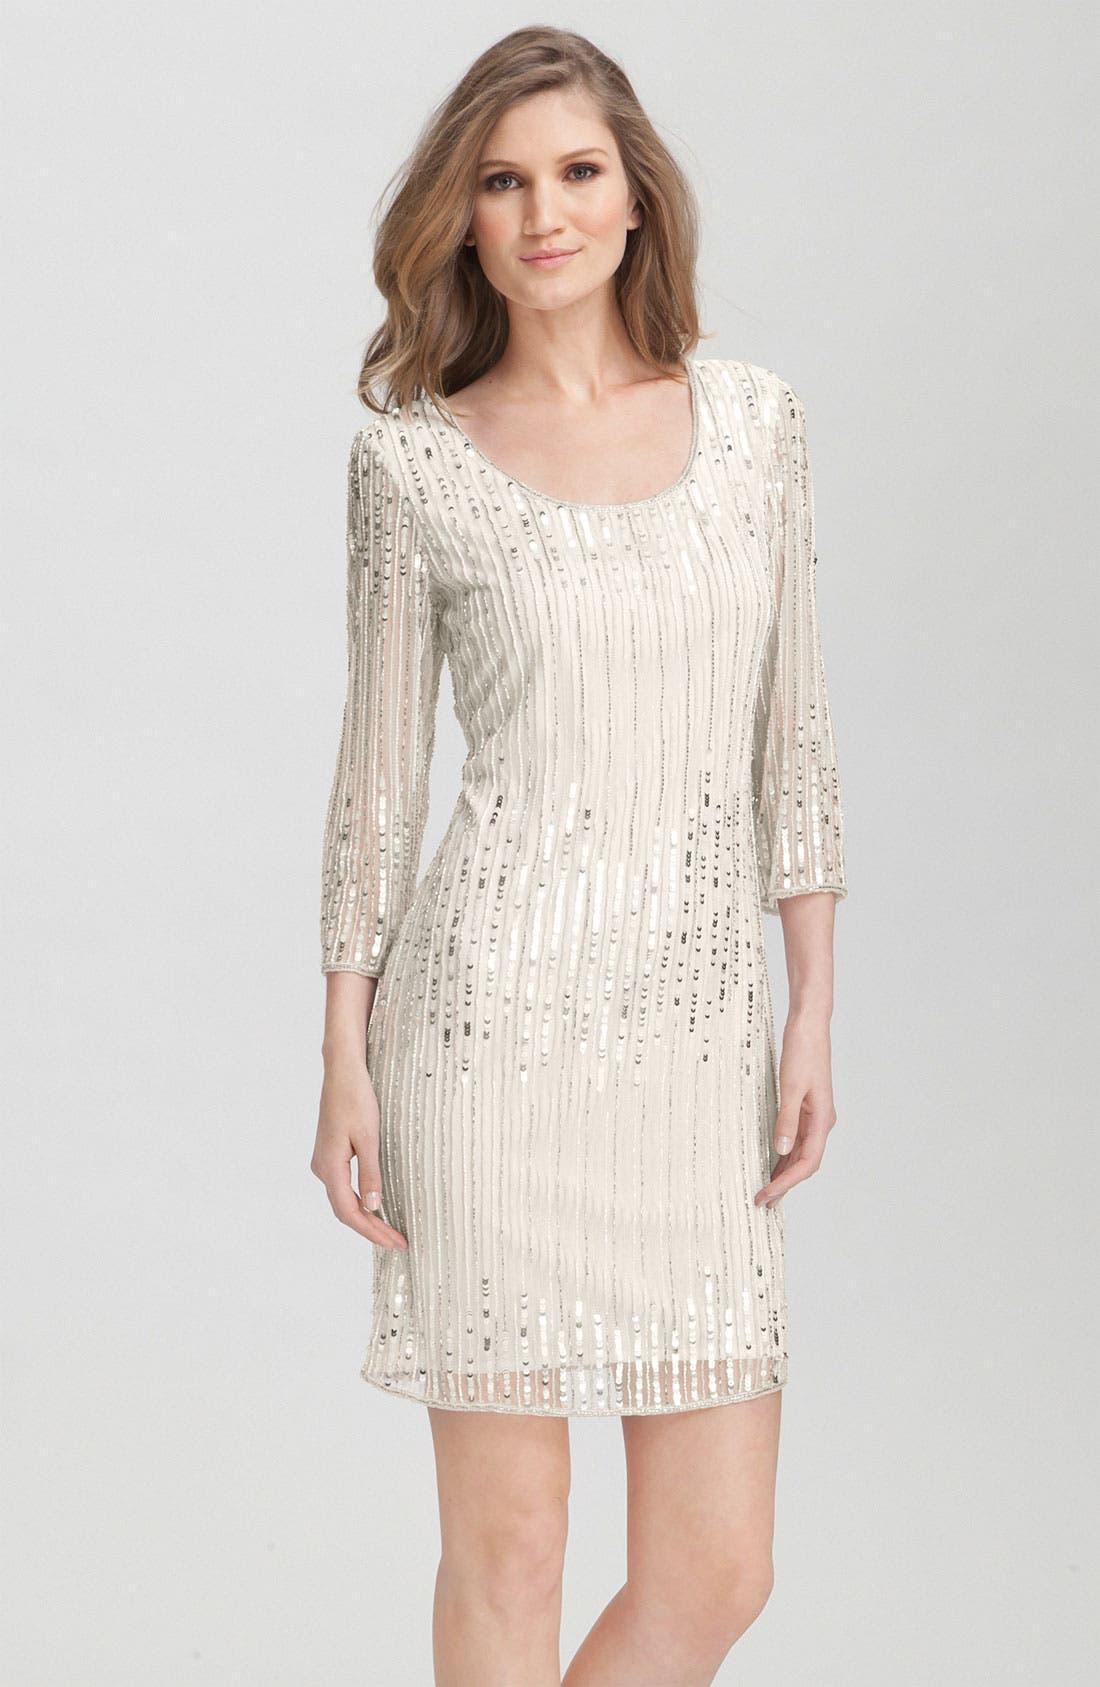 Alternate Image 1 Selected - Pisarro Nights Embellished Overlay Sheath Dress